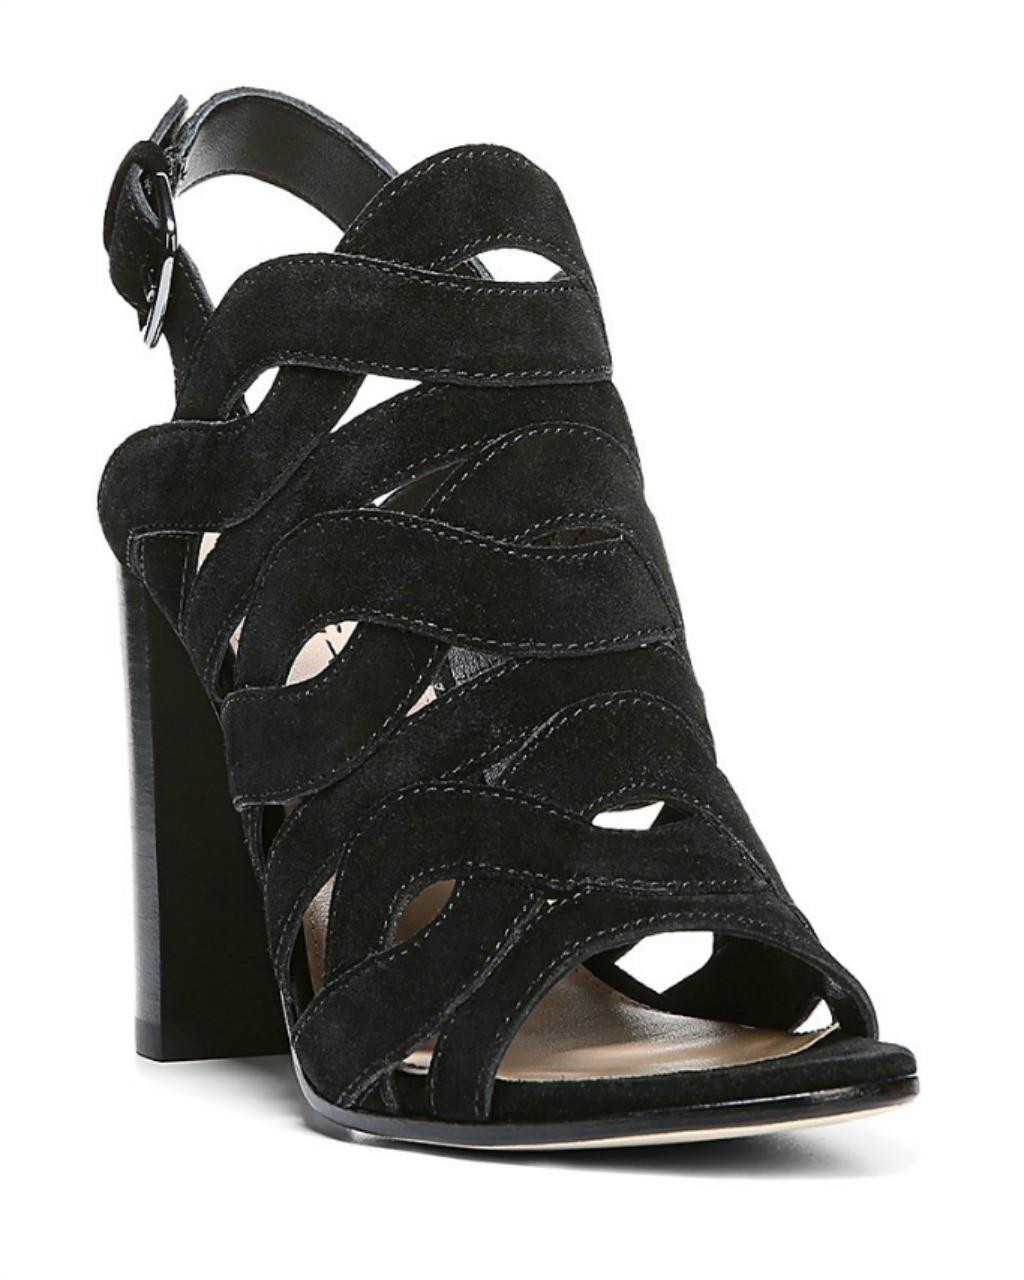 Via Spiga Galore Cutout High Heel Slingback Sandals